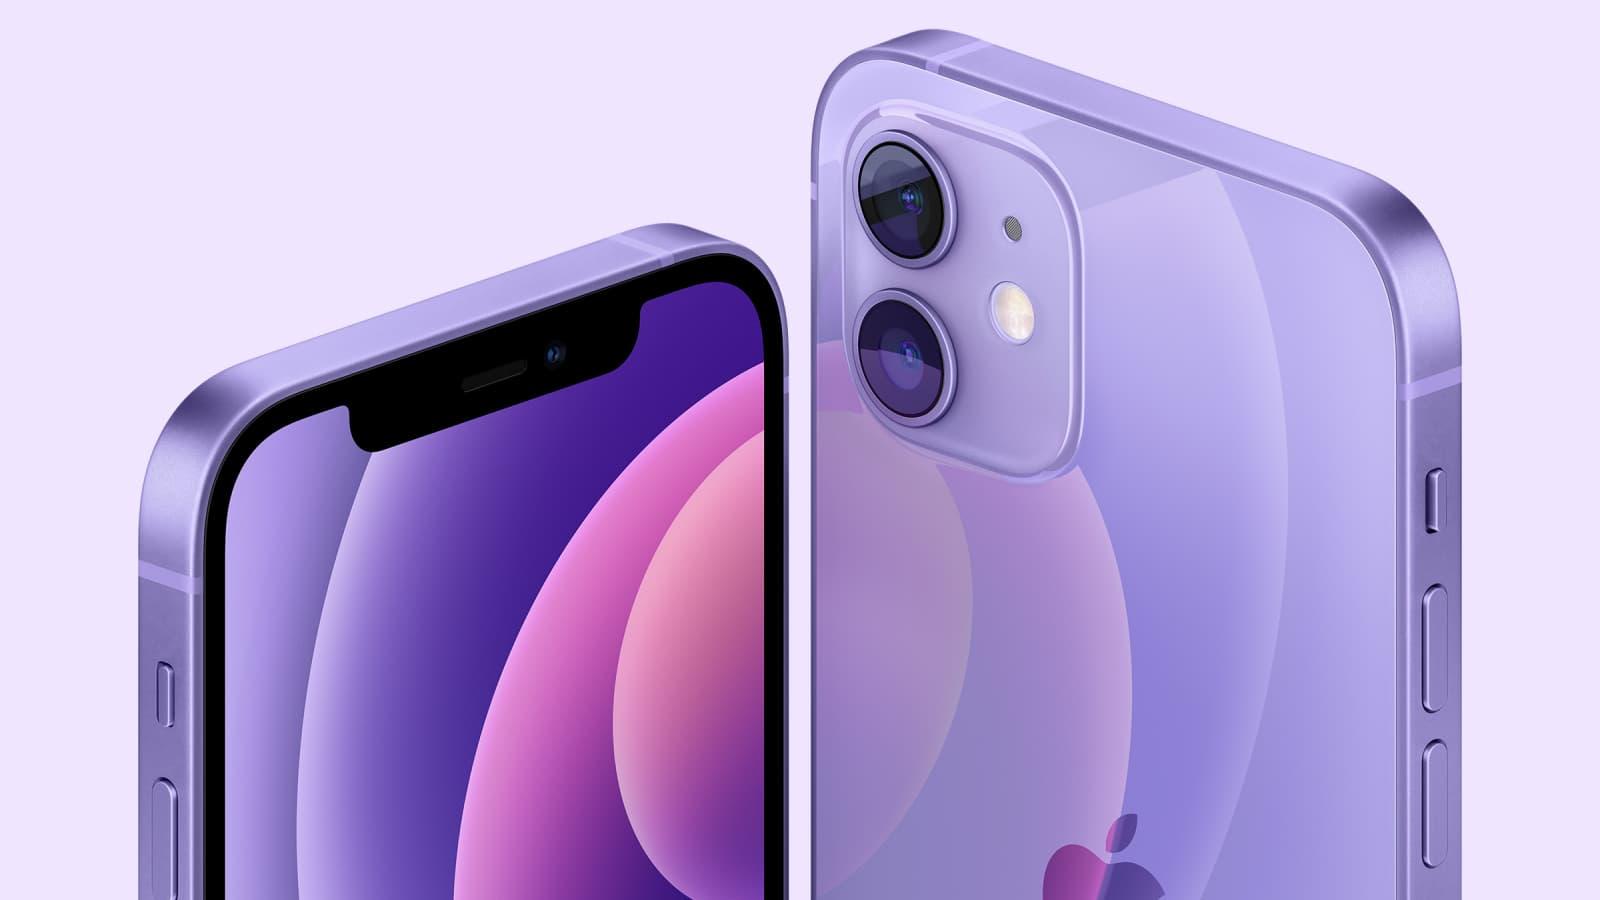 L'iPhone 12 mini à prix mini pour un plaisir maxi